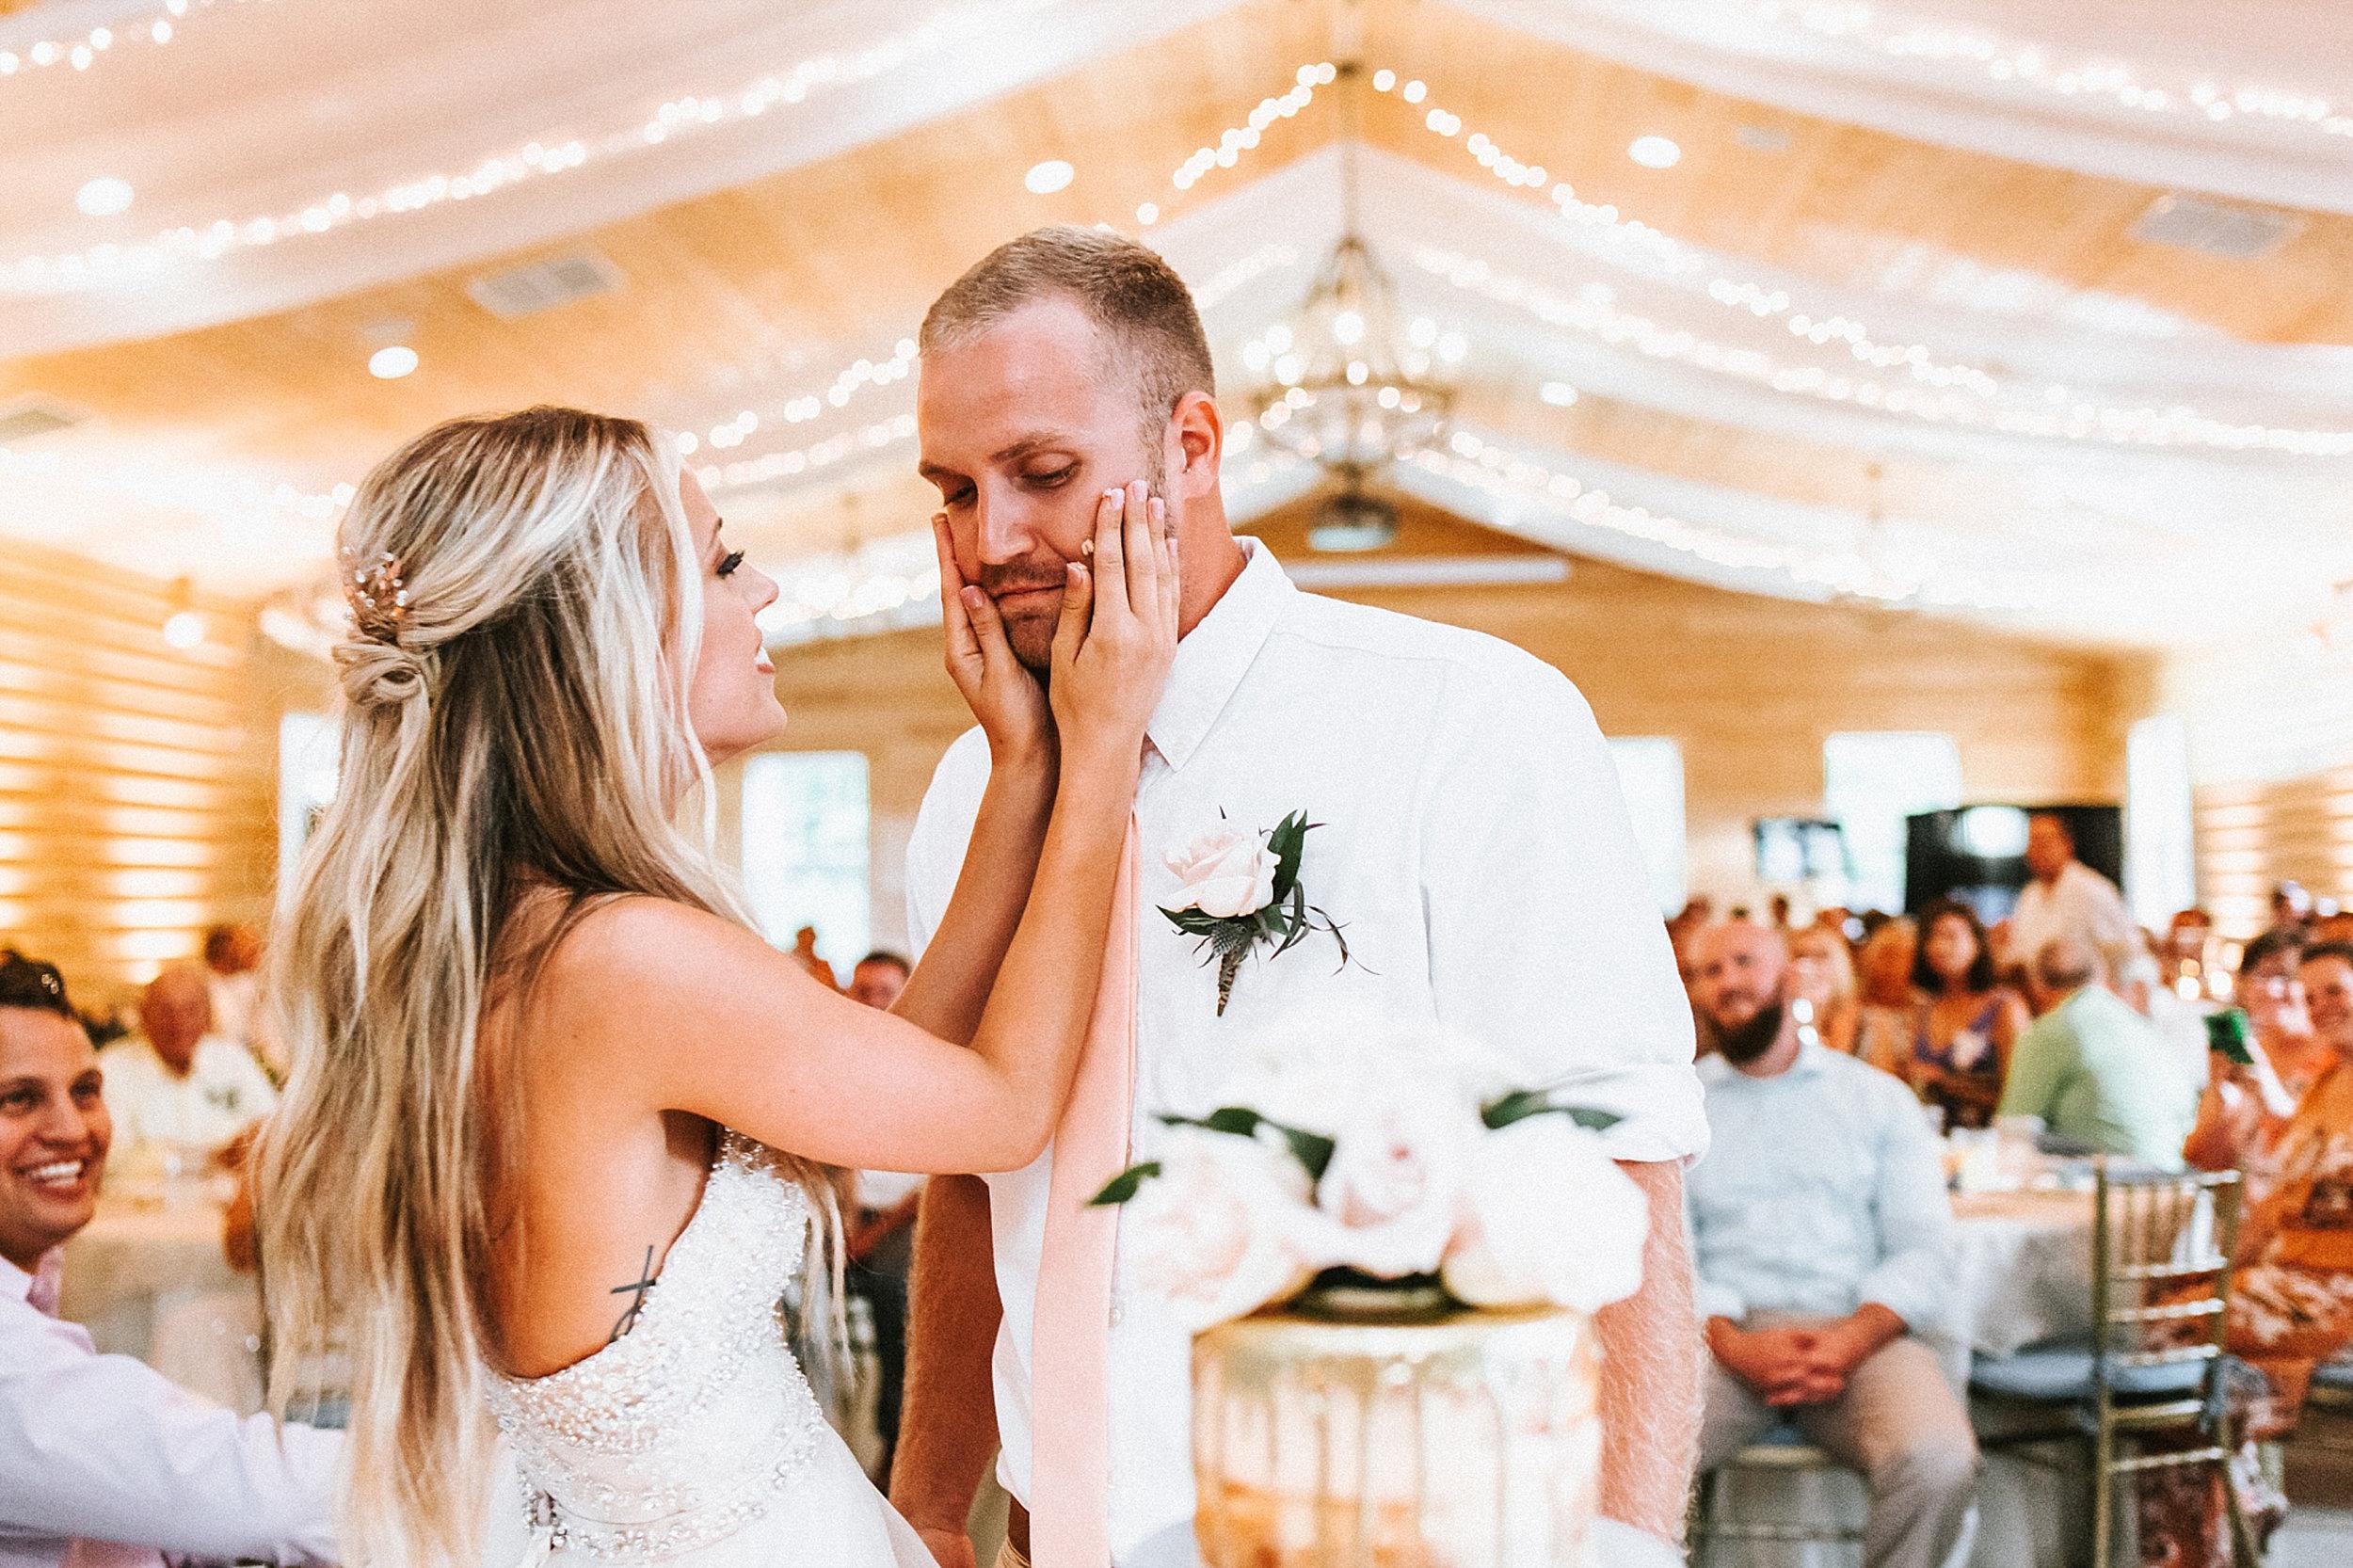 Brooke Townsend Photography - Cincinnati Wedding Photographer (142 of 153).jpg